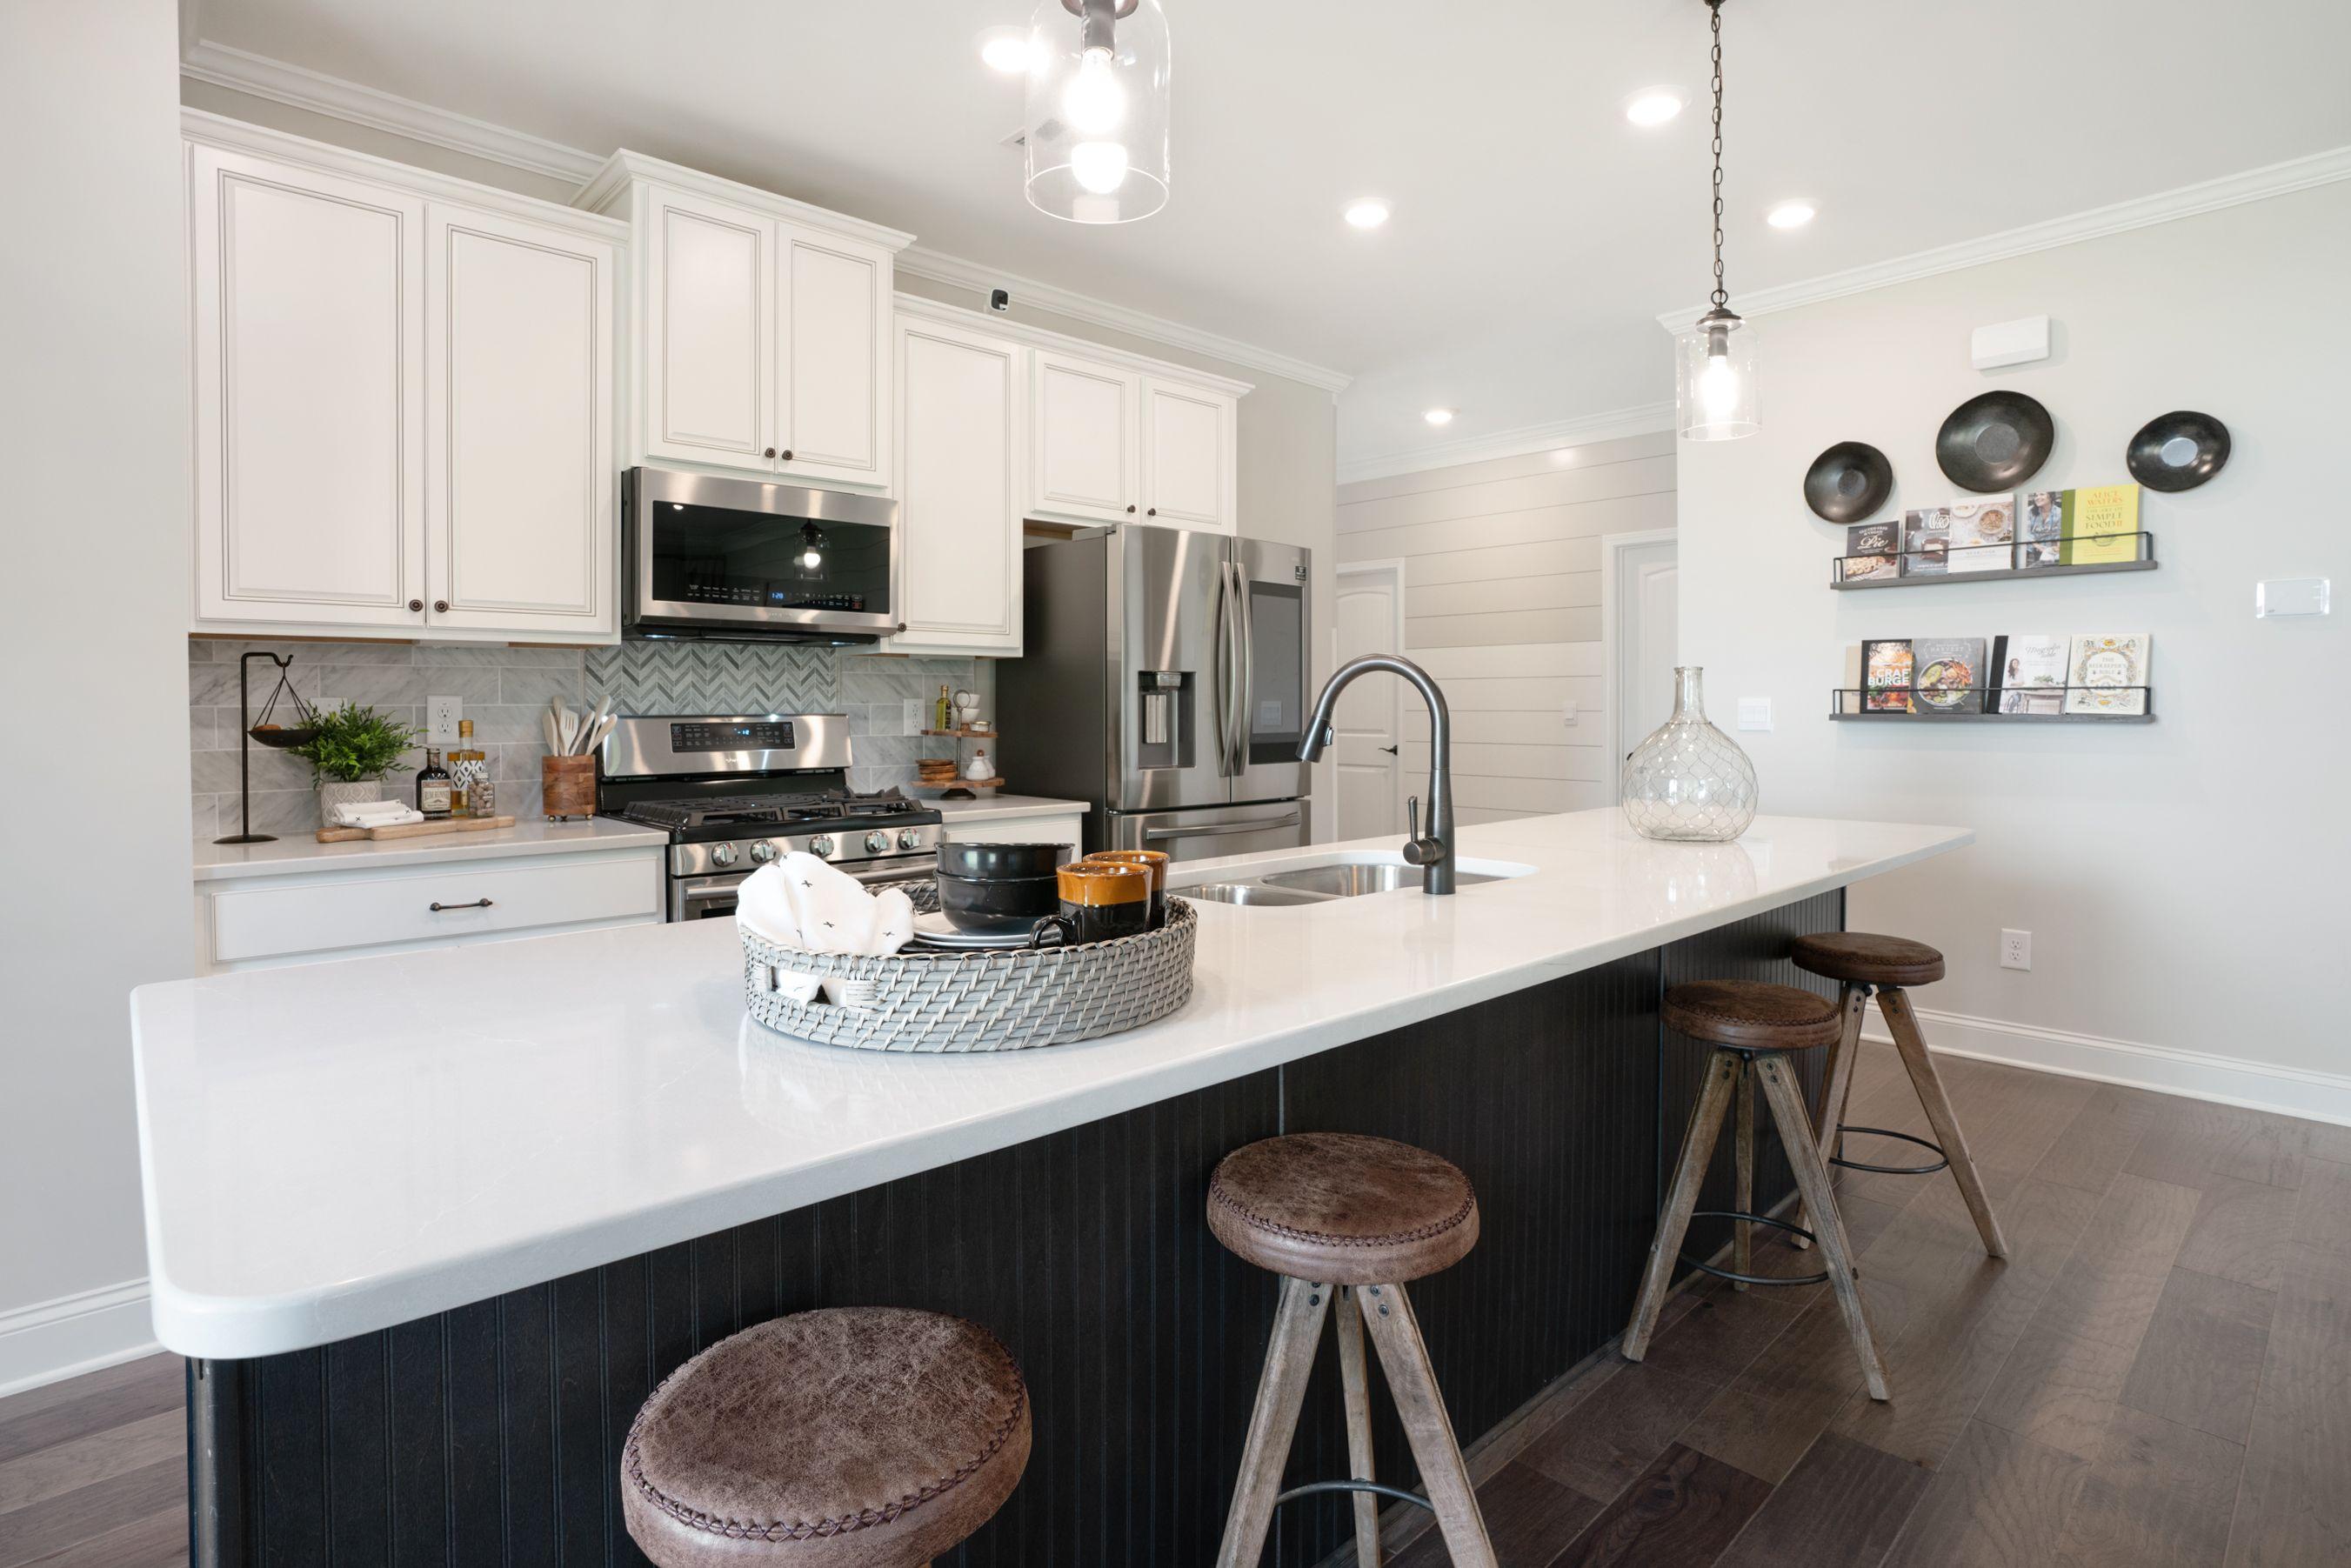 Kitchen featured in the Rabun (Active Adult) By Artisan Built Communities in Atlanta, GA